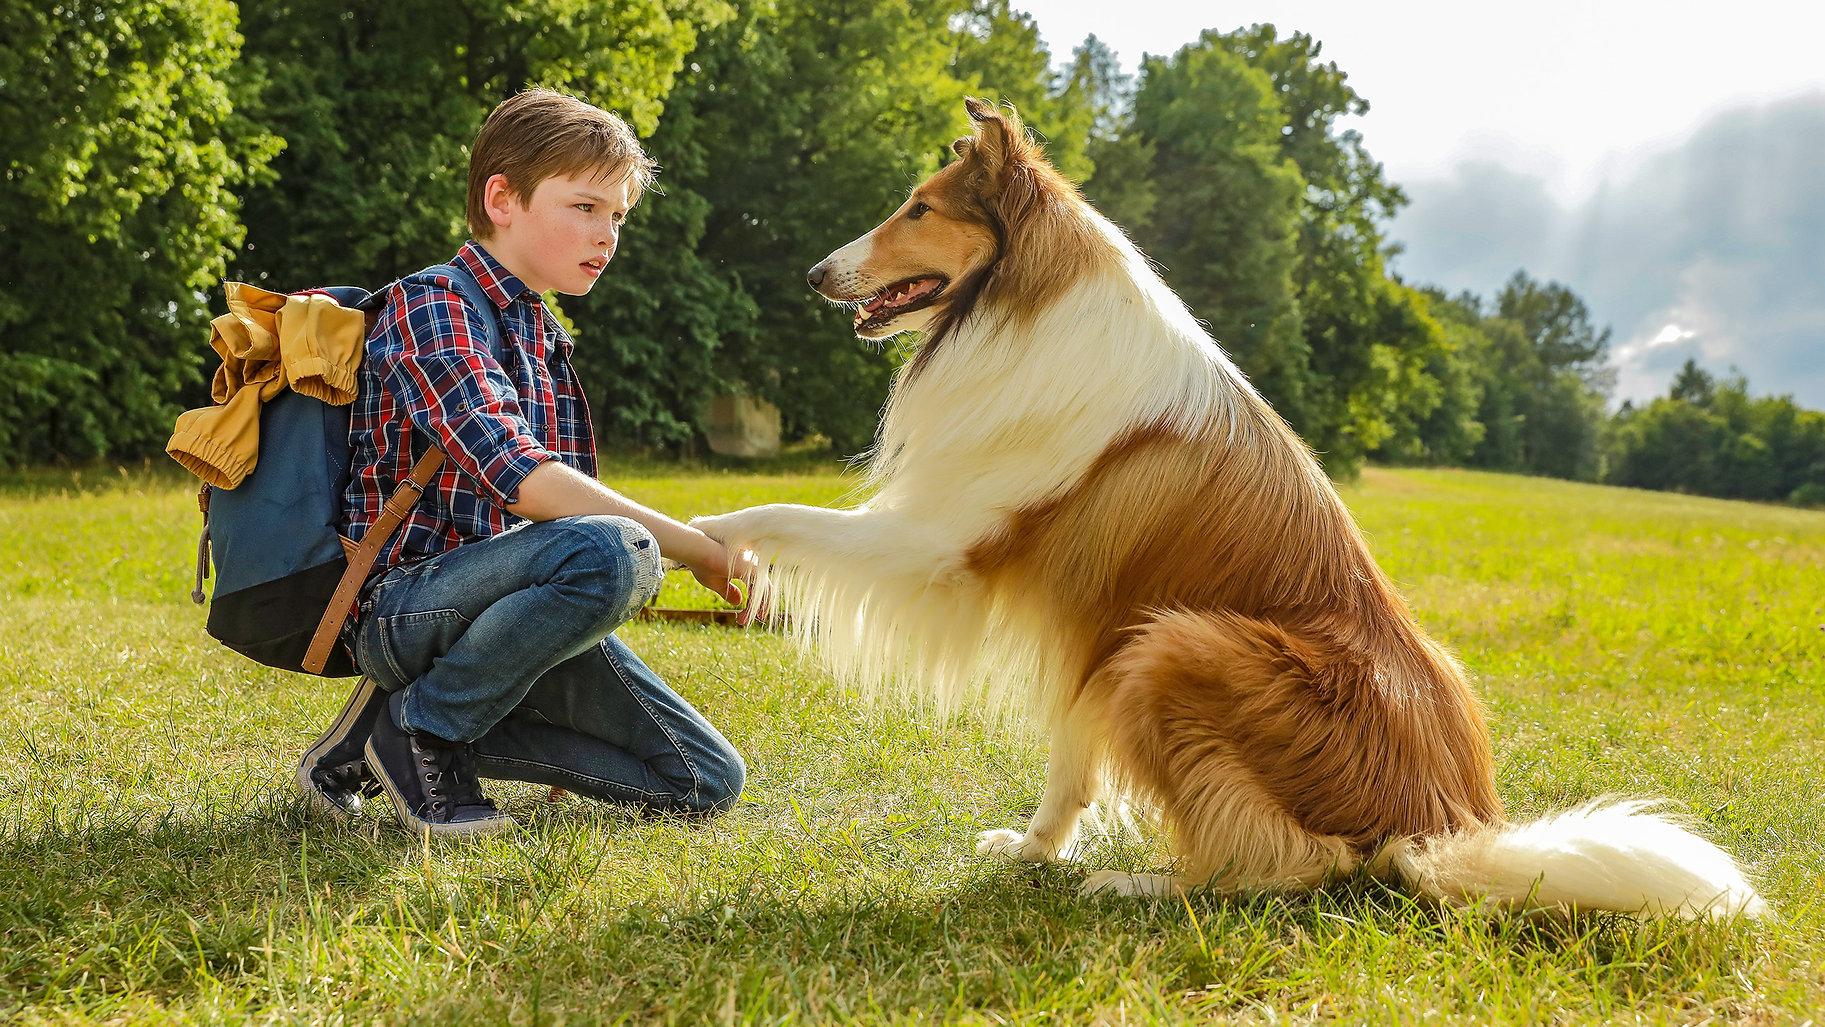 Lassie Come Home © 2019 LCH Film UG  War